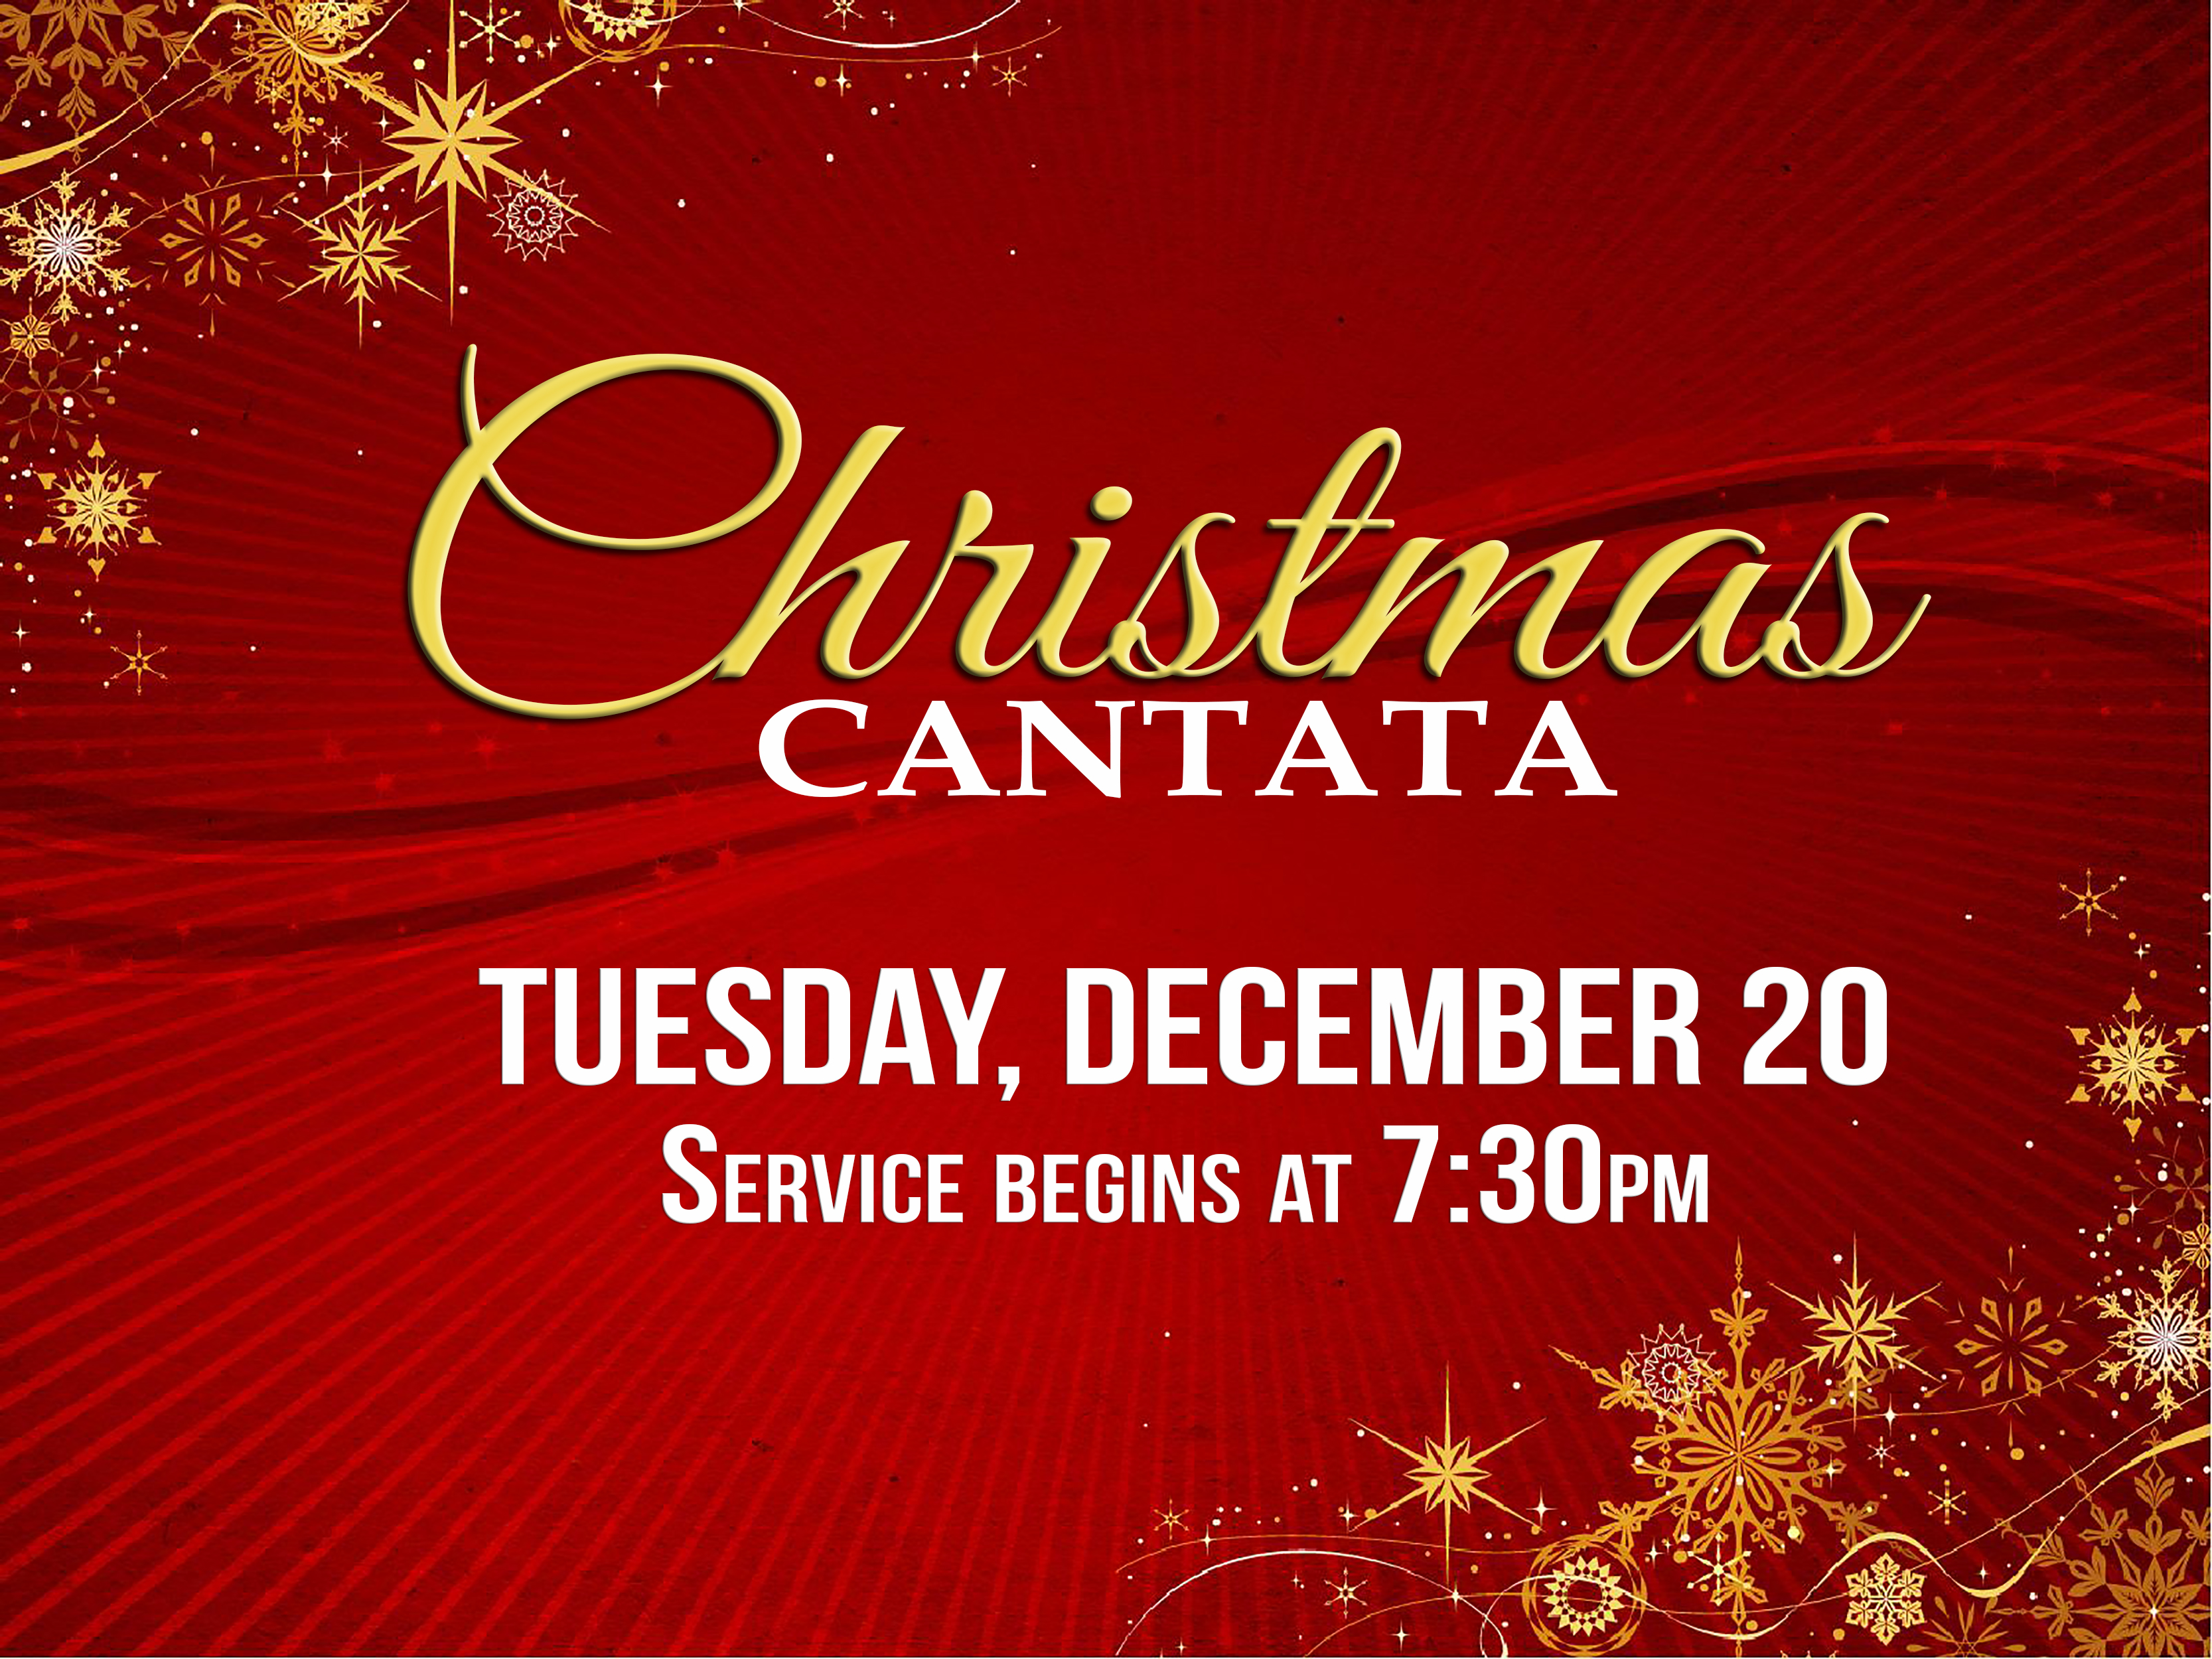 Christmas Cantata.We Are The Cityline Church Christmas Cantata